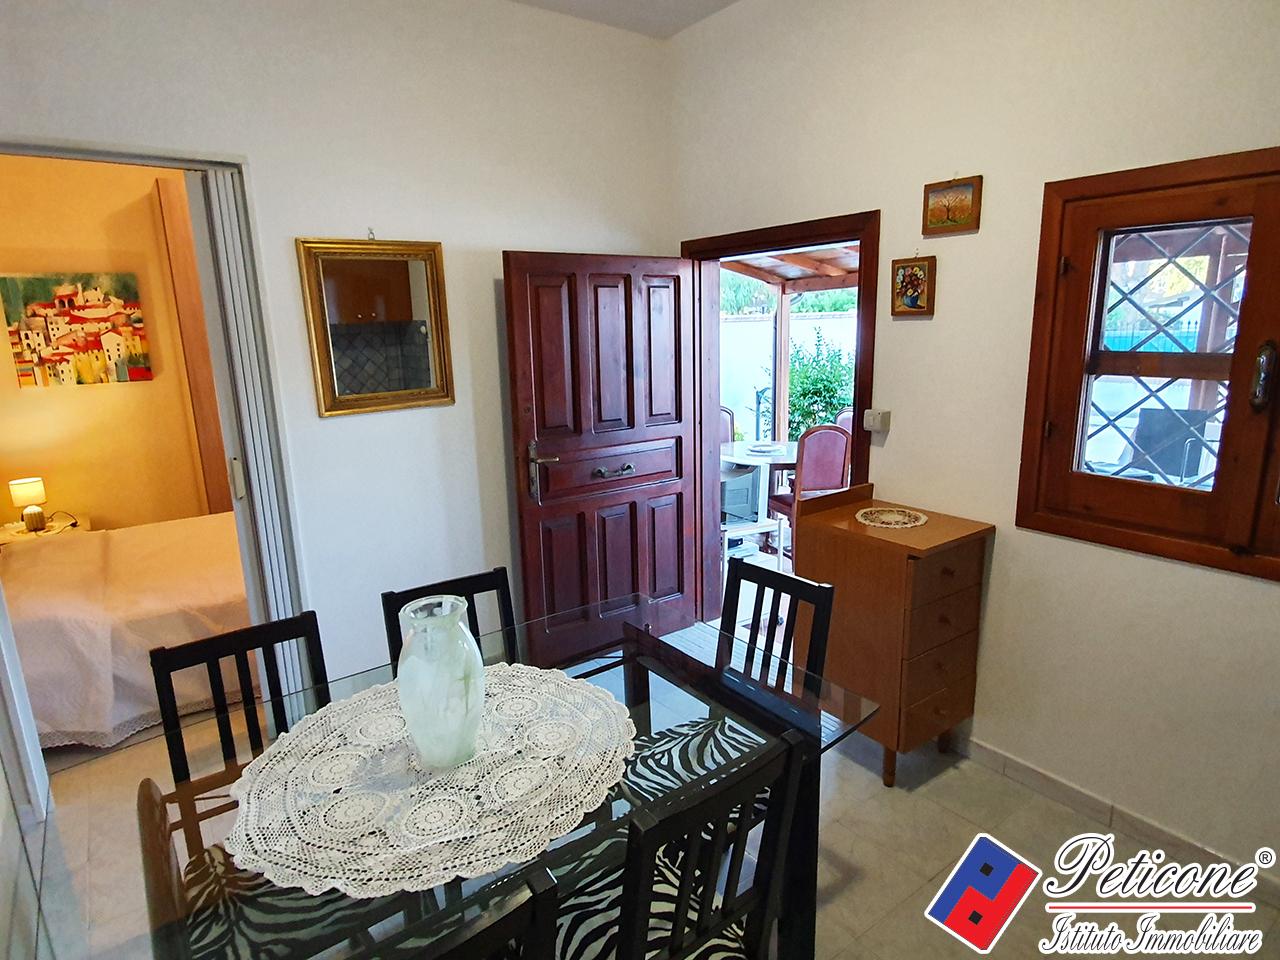 Villa in Vendita a Fondi: 4 locali, 50 mq - Foto 3